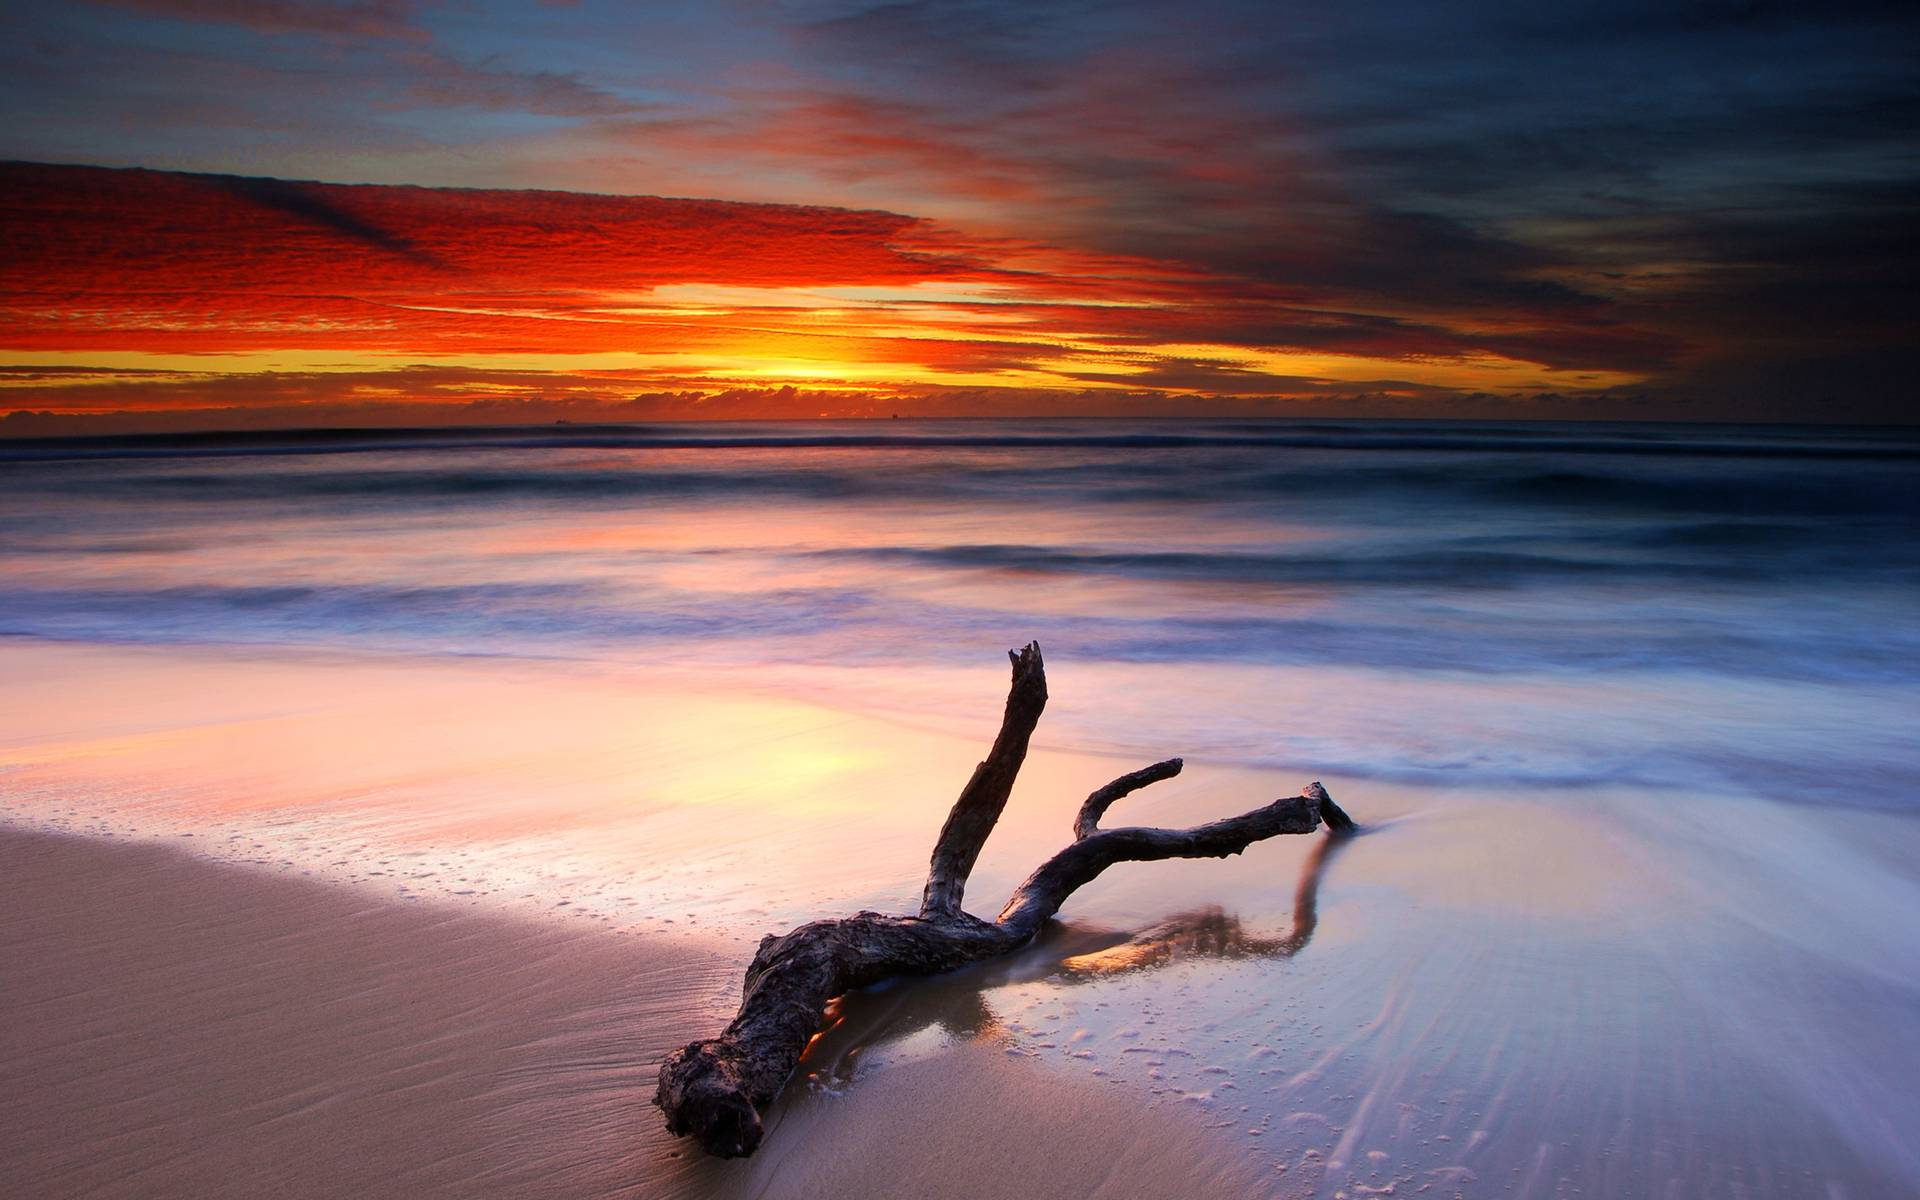 sunset beach nature sea - photo #8